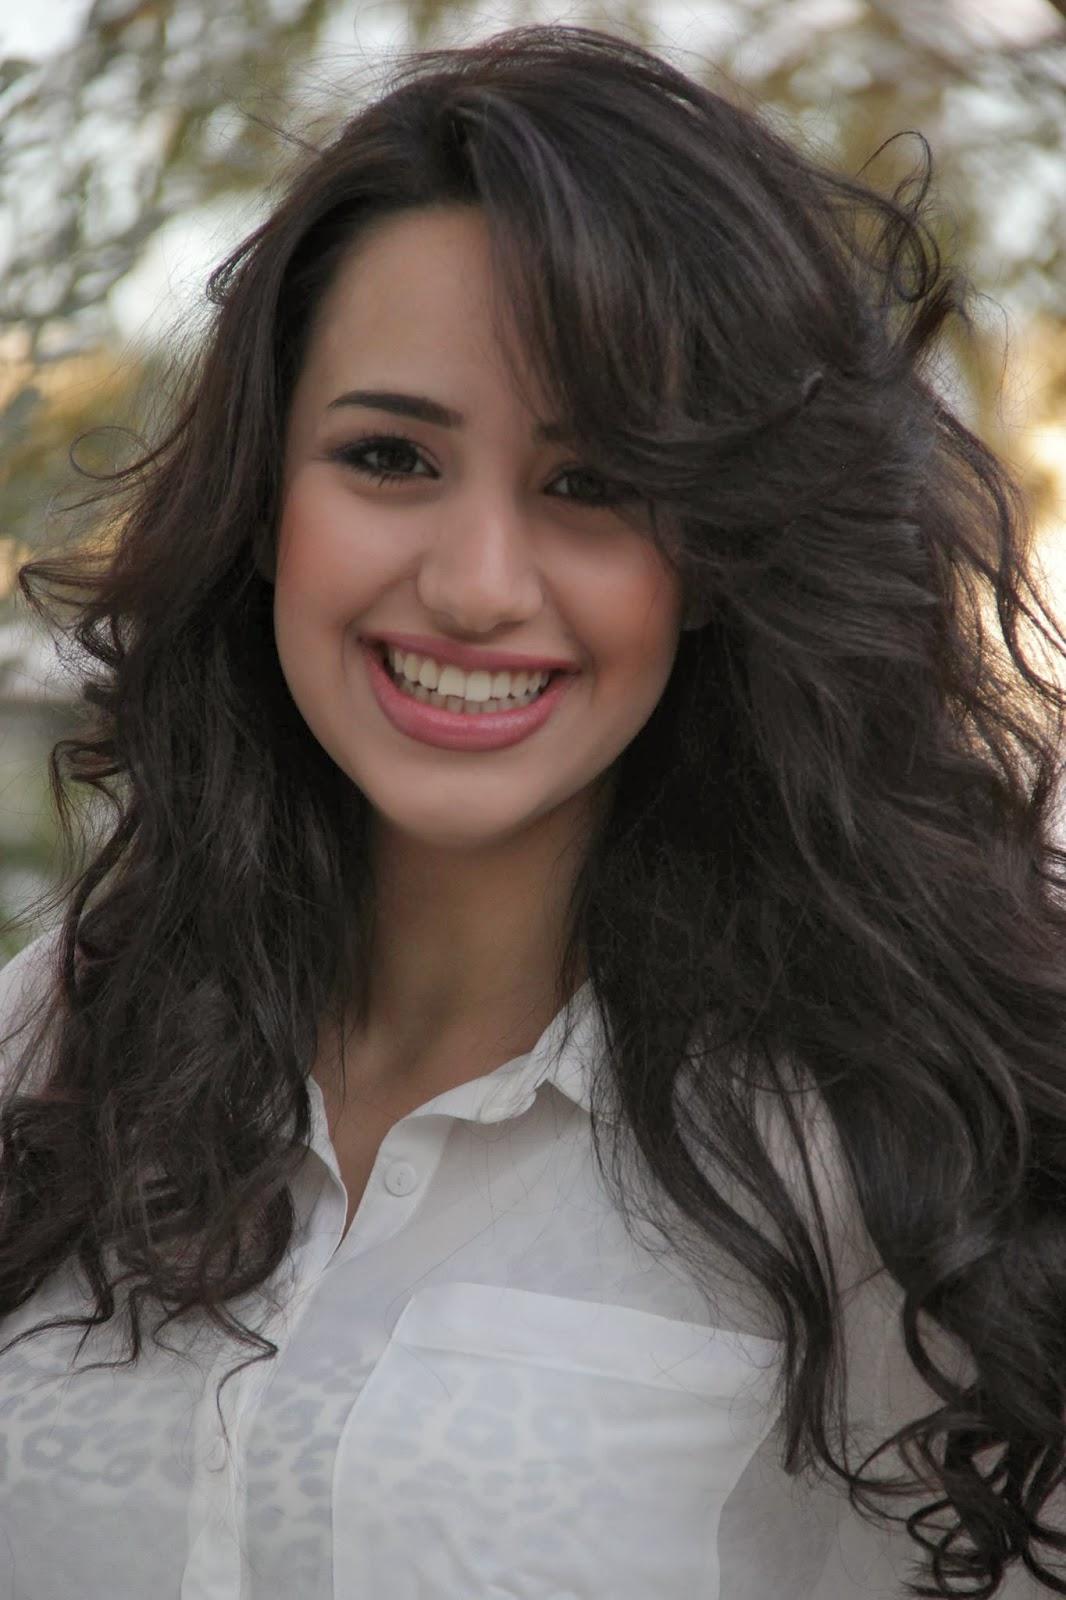 Marwa dance tunisie tunis tunisia 9a7ba